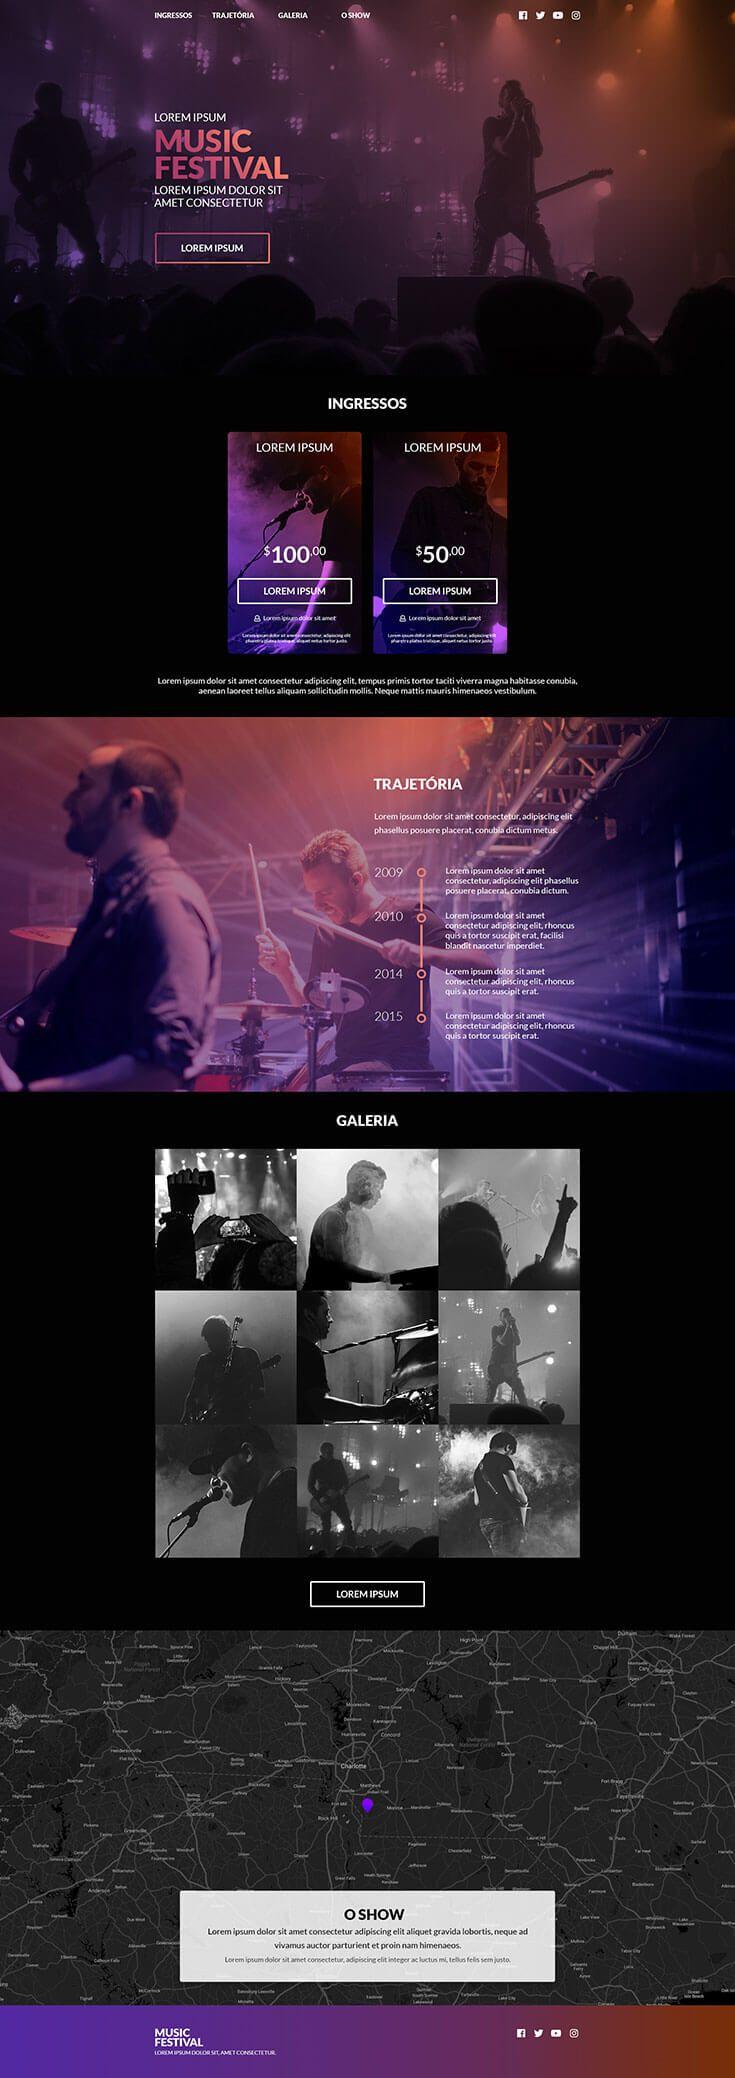 Free Music Festival Website Template Website Design Layout Webpage Design Wix Website Design